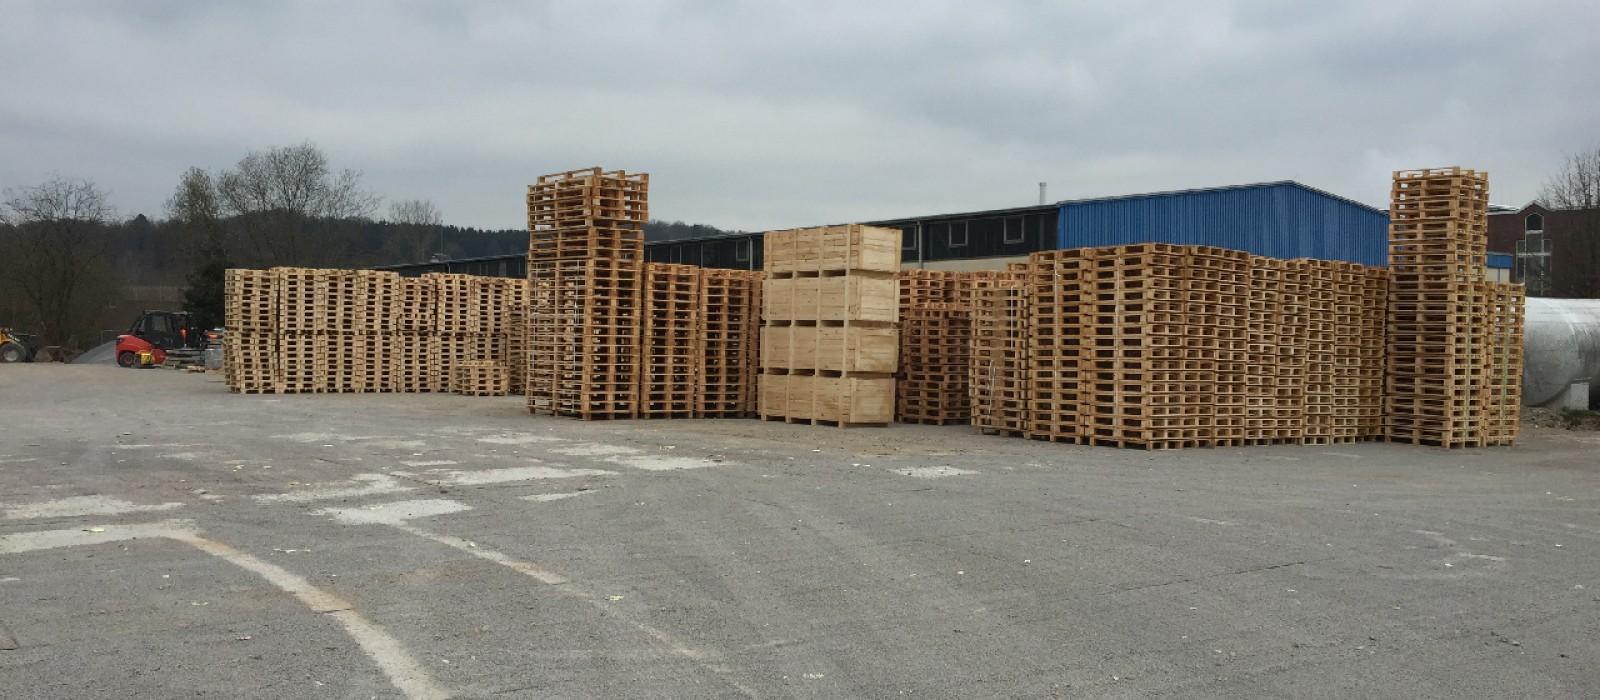 Exportkisten-hitzebehandelt-aus-Massivholz